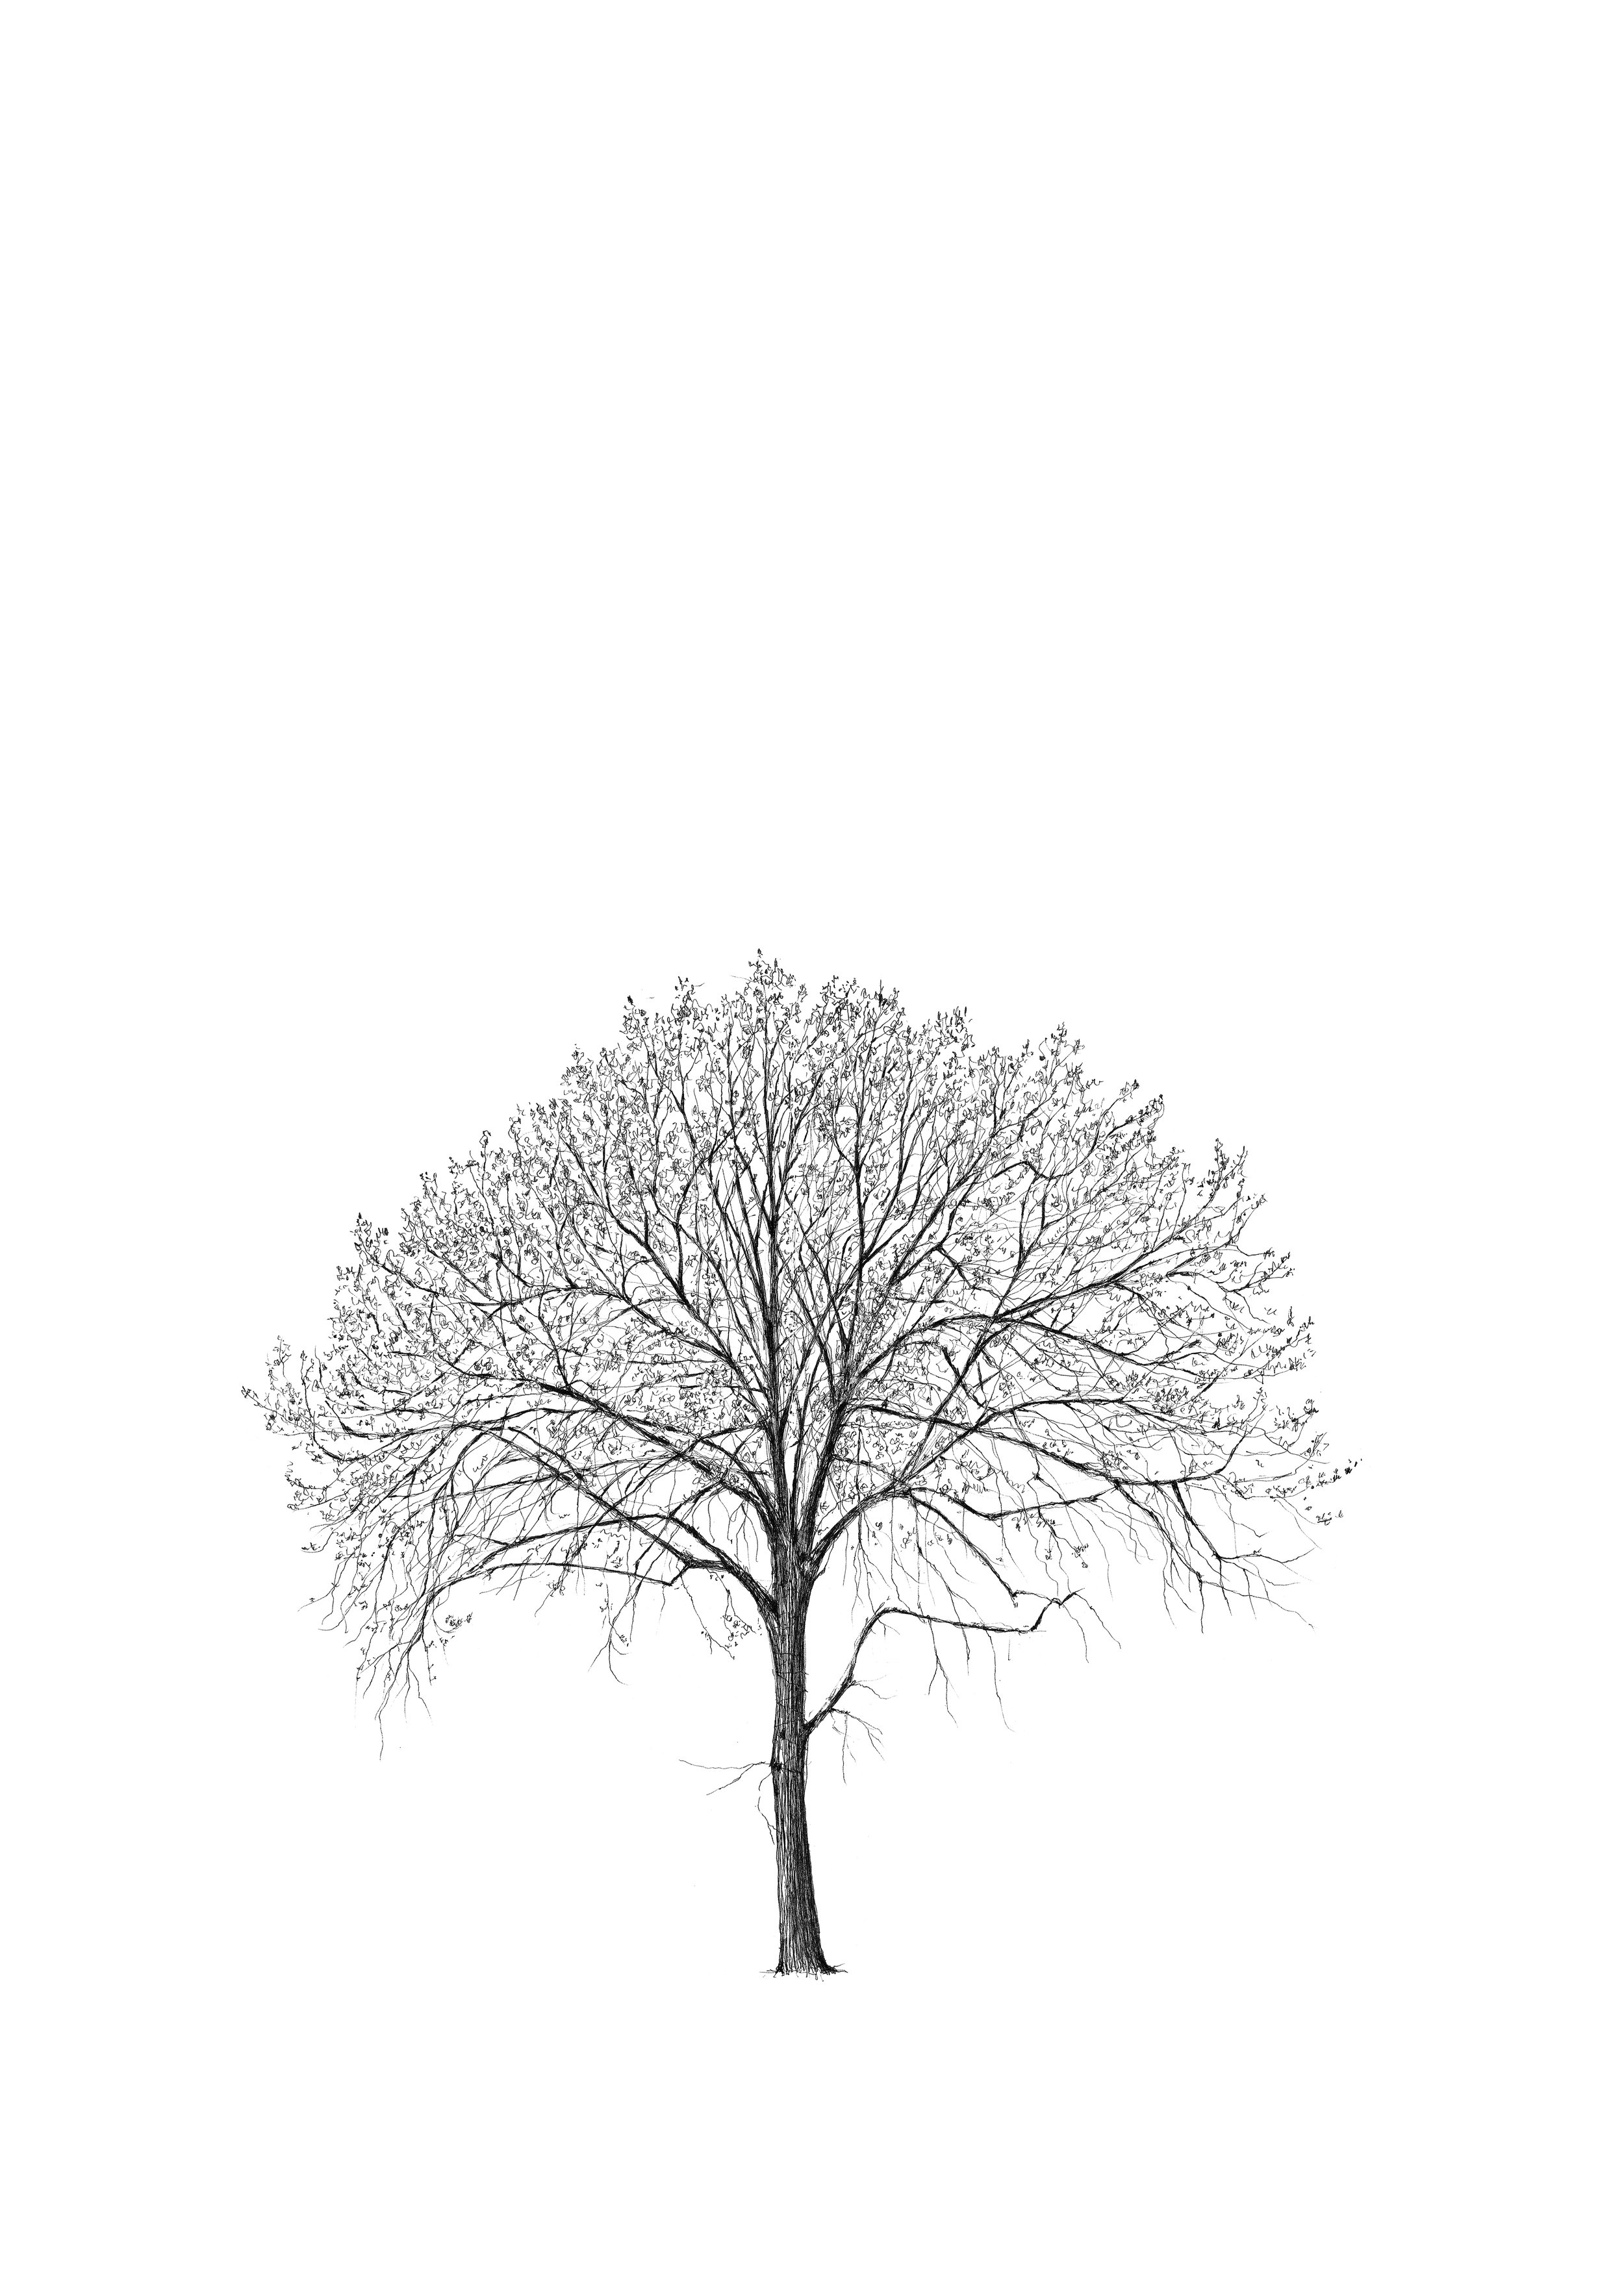 MARYLEBONE ELM TREE - LUKE ADAM HAWKER -LOW RES.jpg